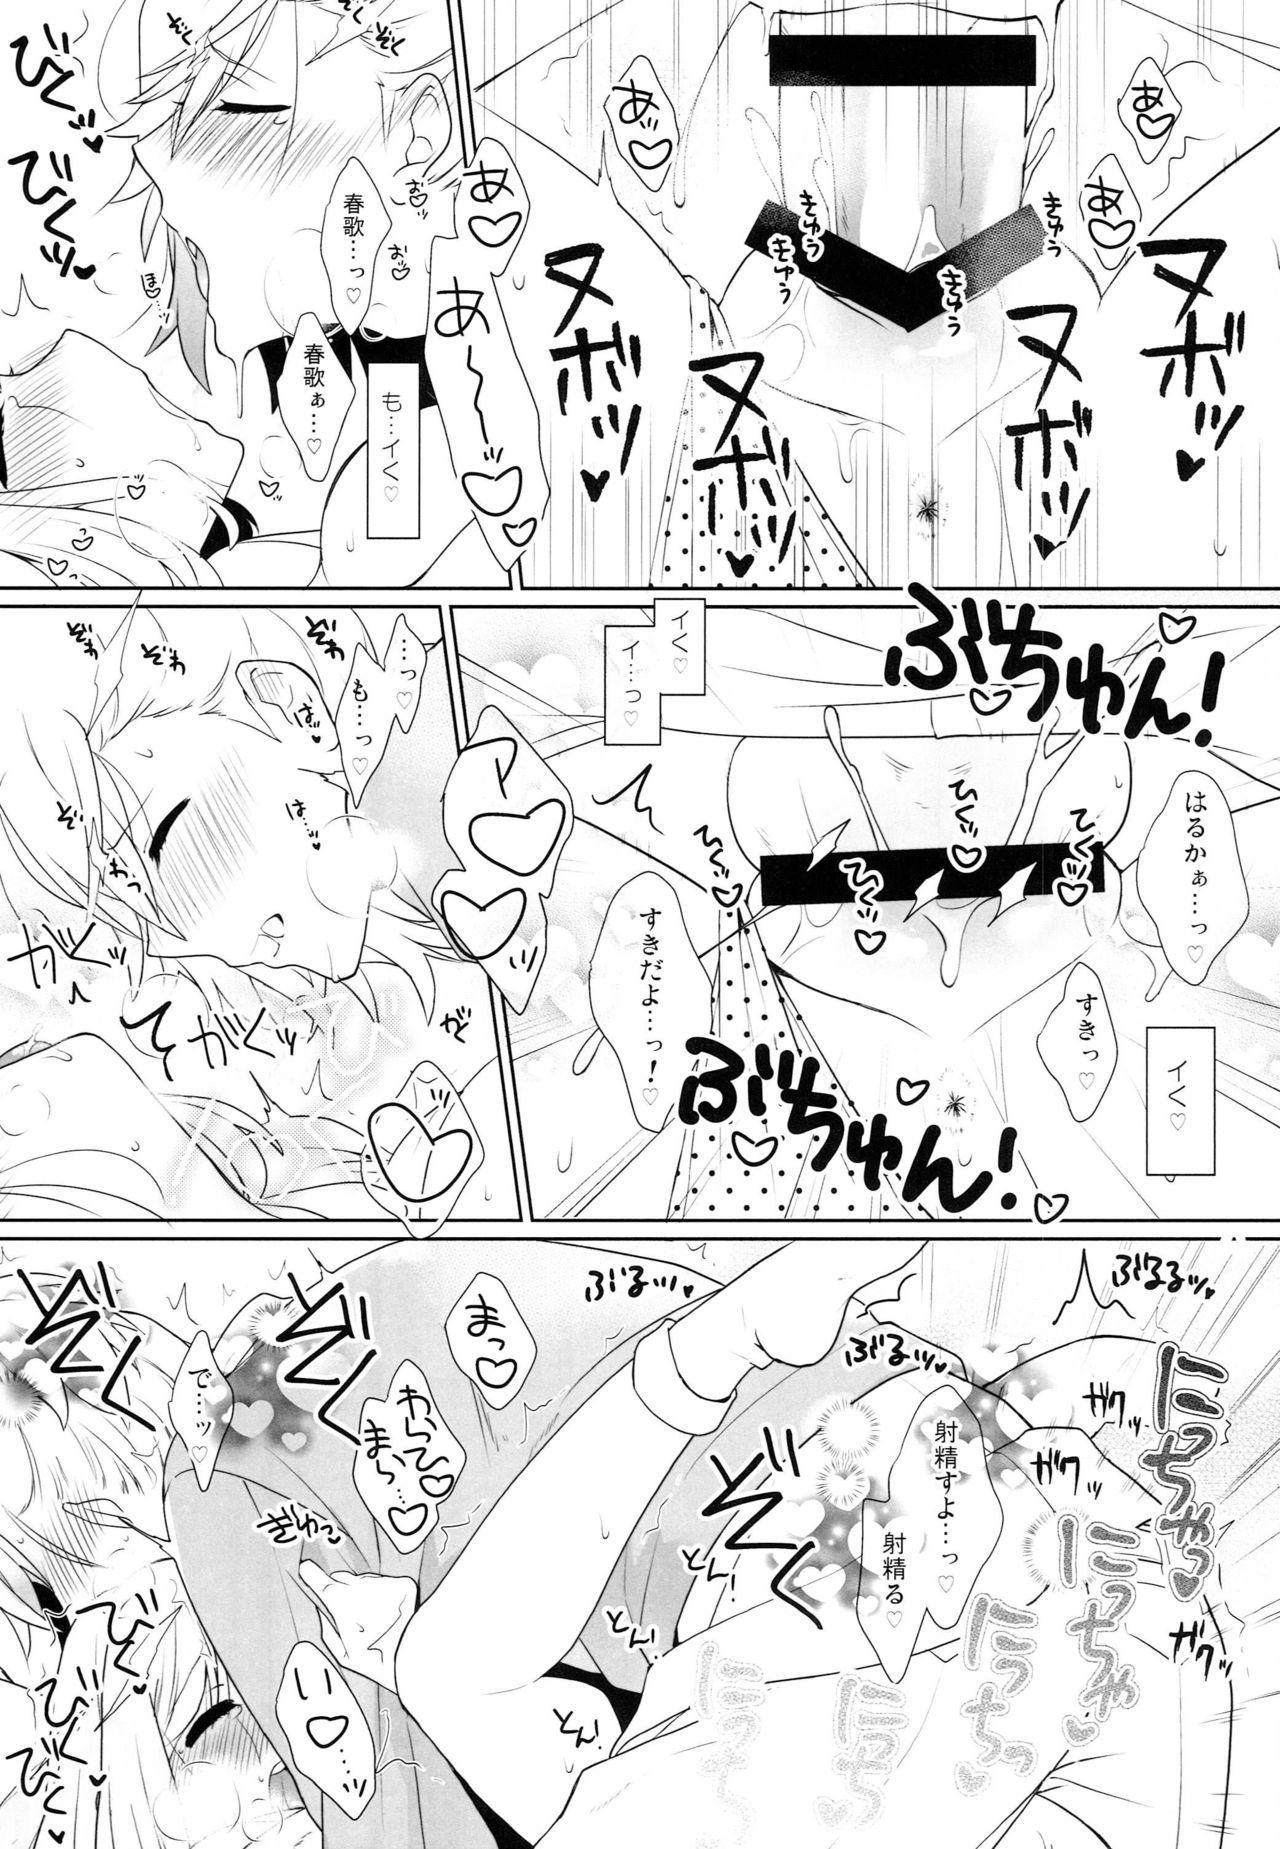 Korekara Wonderland 11